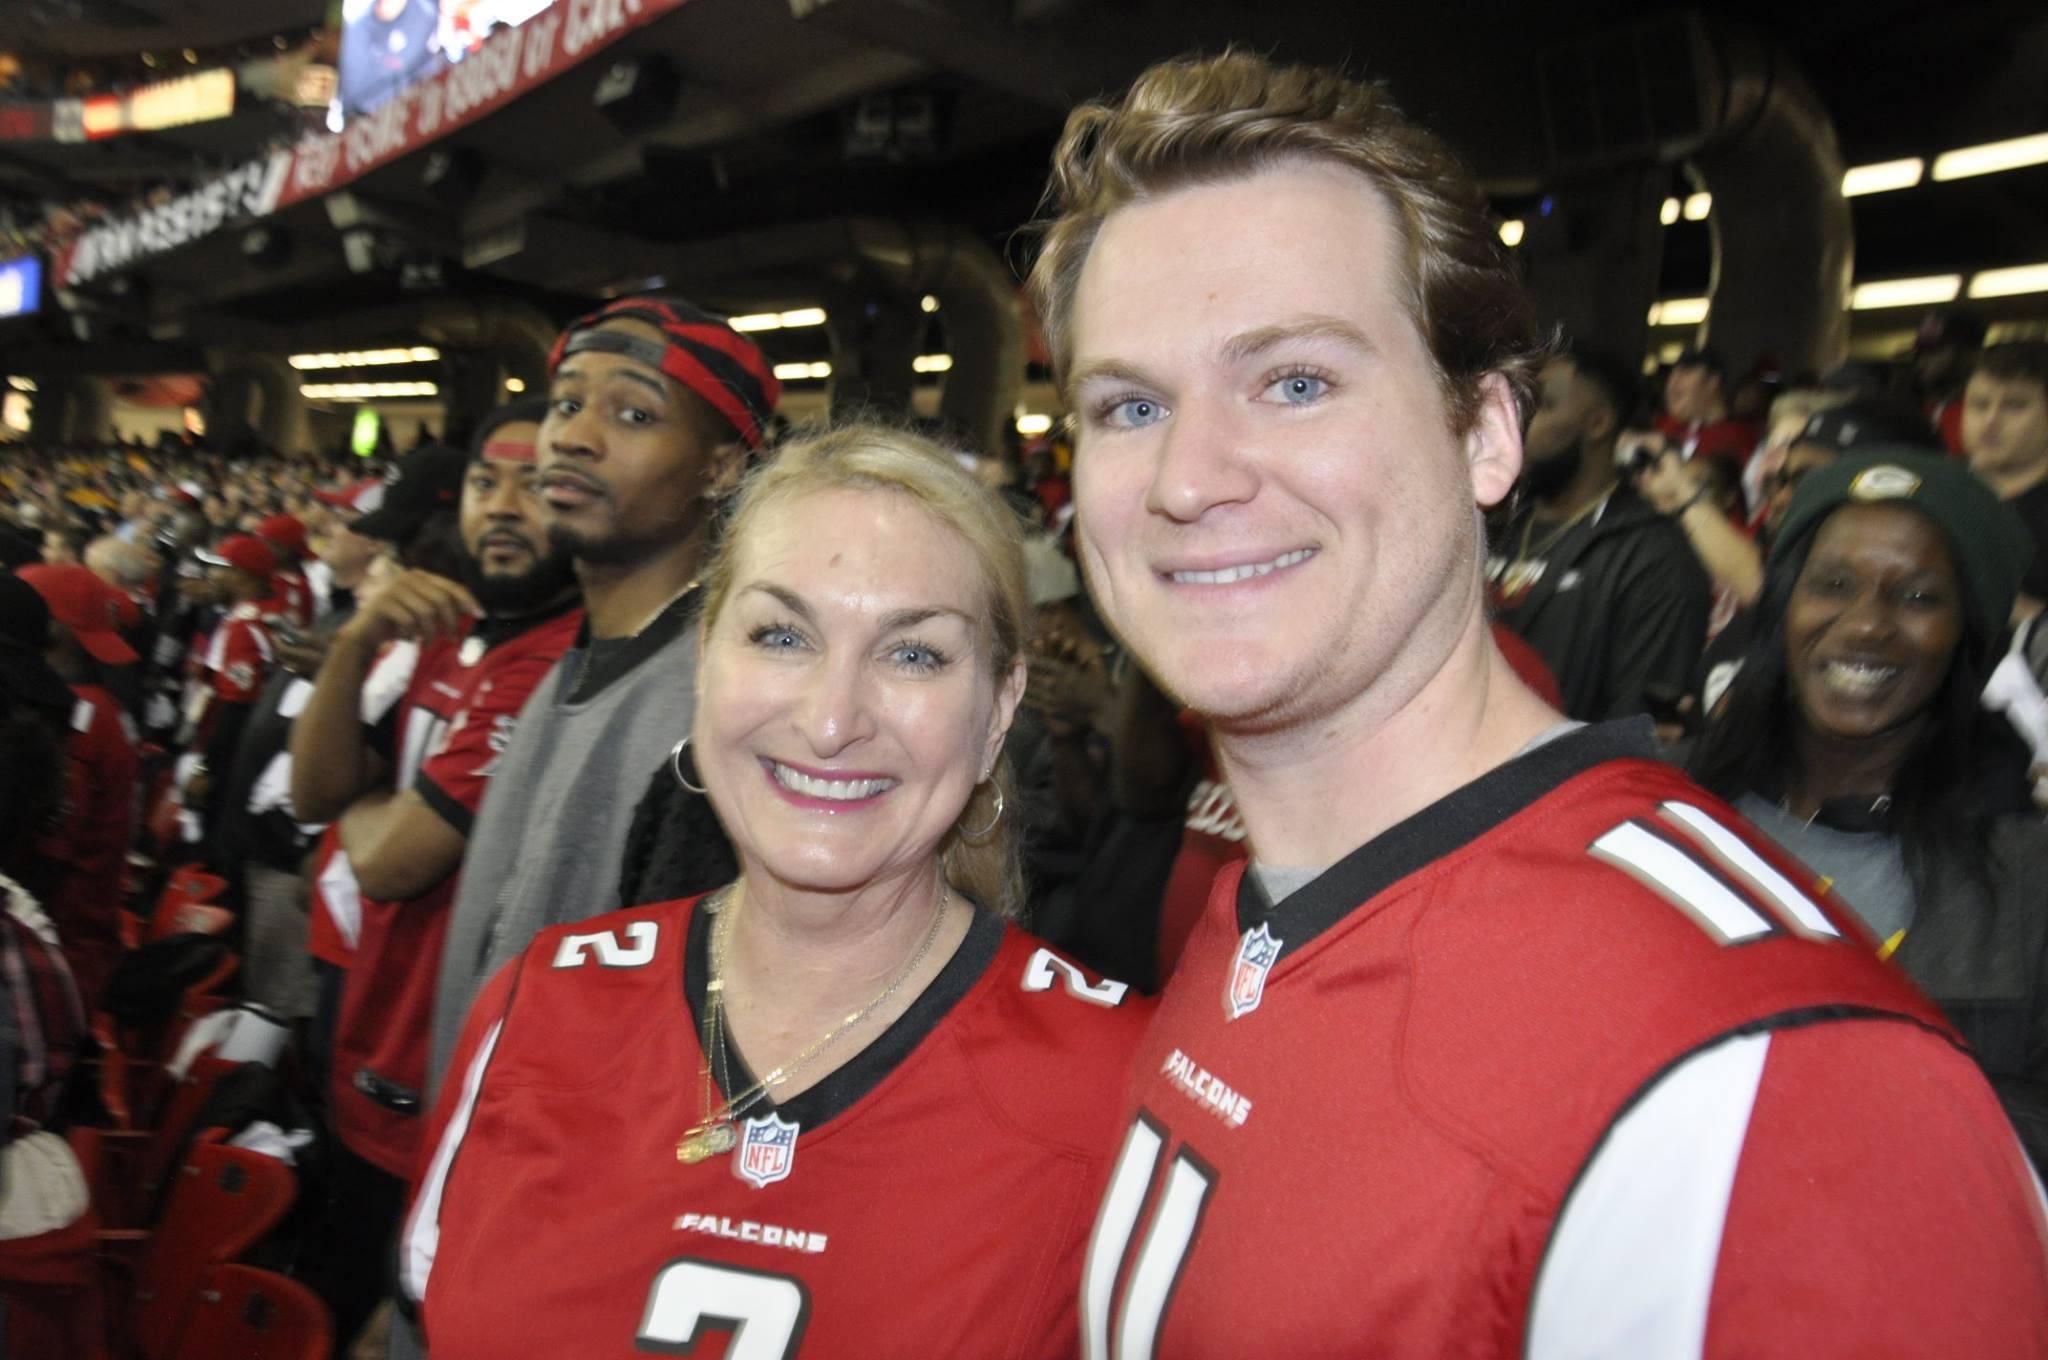 Patty Watkins - 2017 Super Bowl Challenge Check Presentation - Emory Winship Cancer Institute